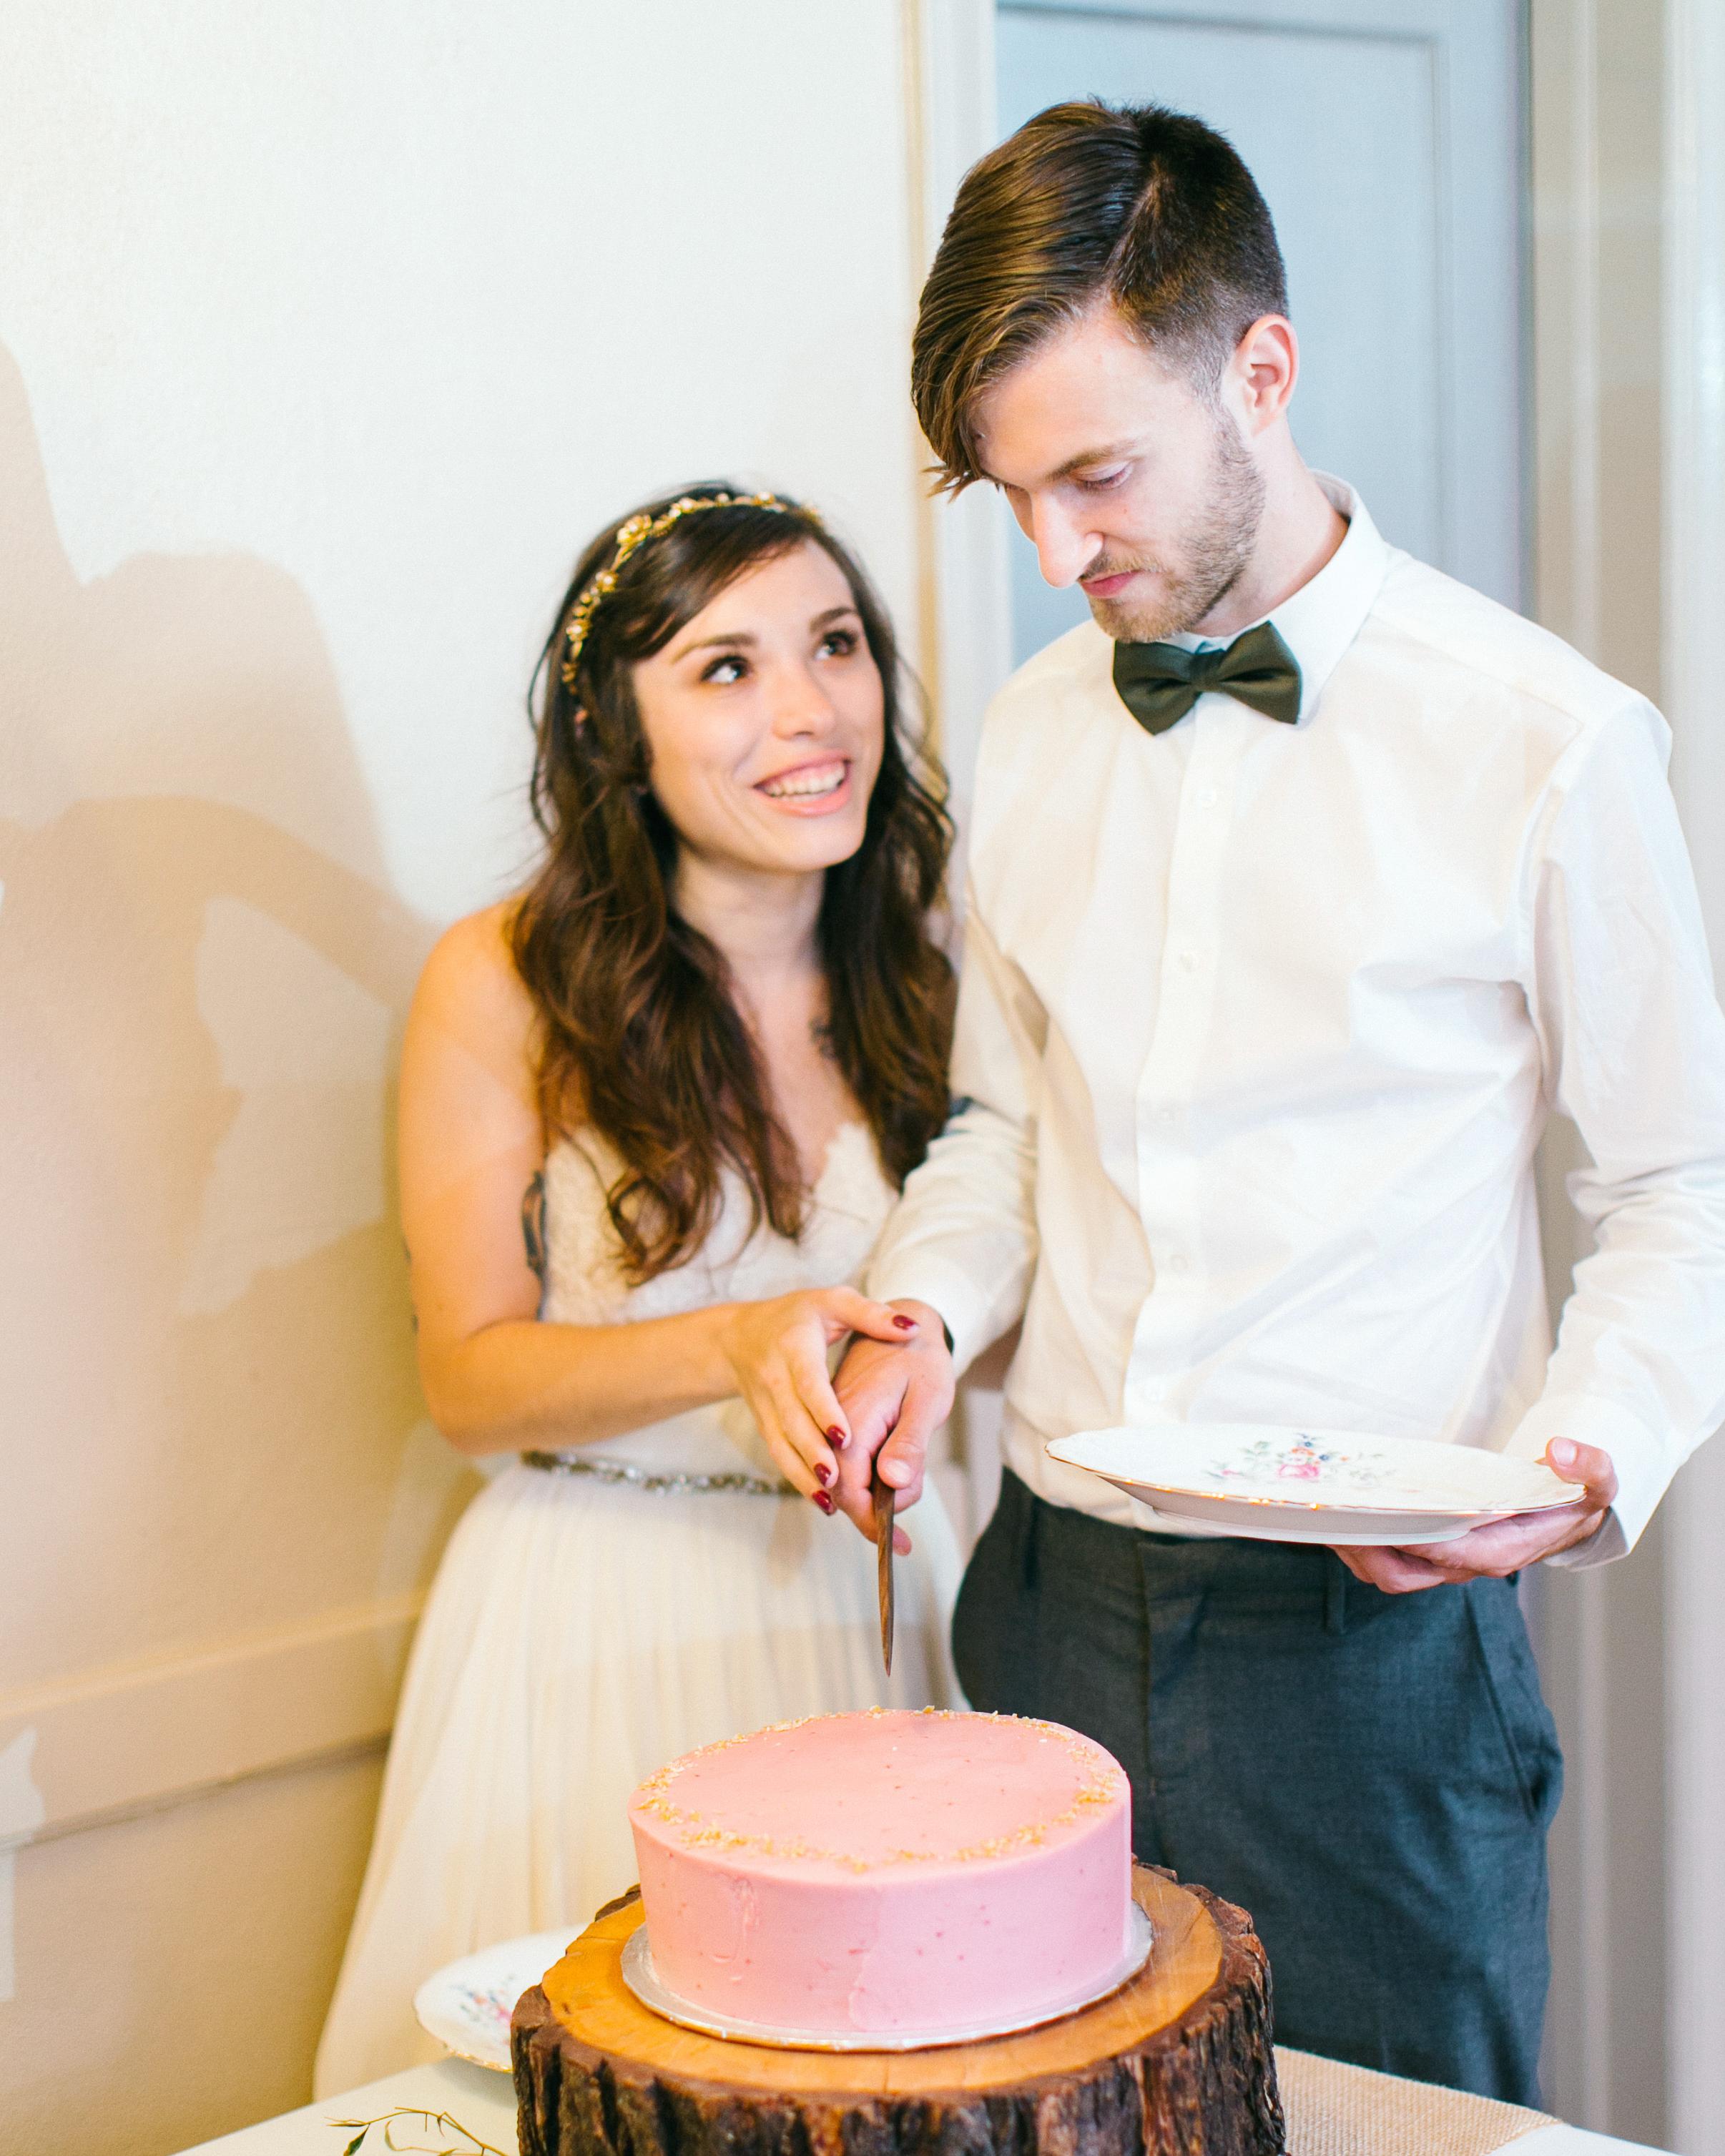 marguerita-aaron-wedding-cakecutting-434-s111848-0214.jpg